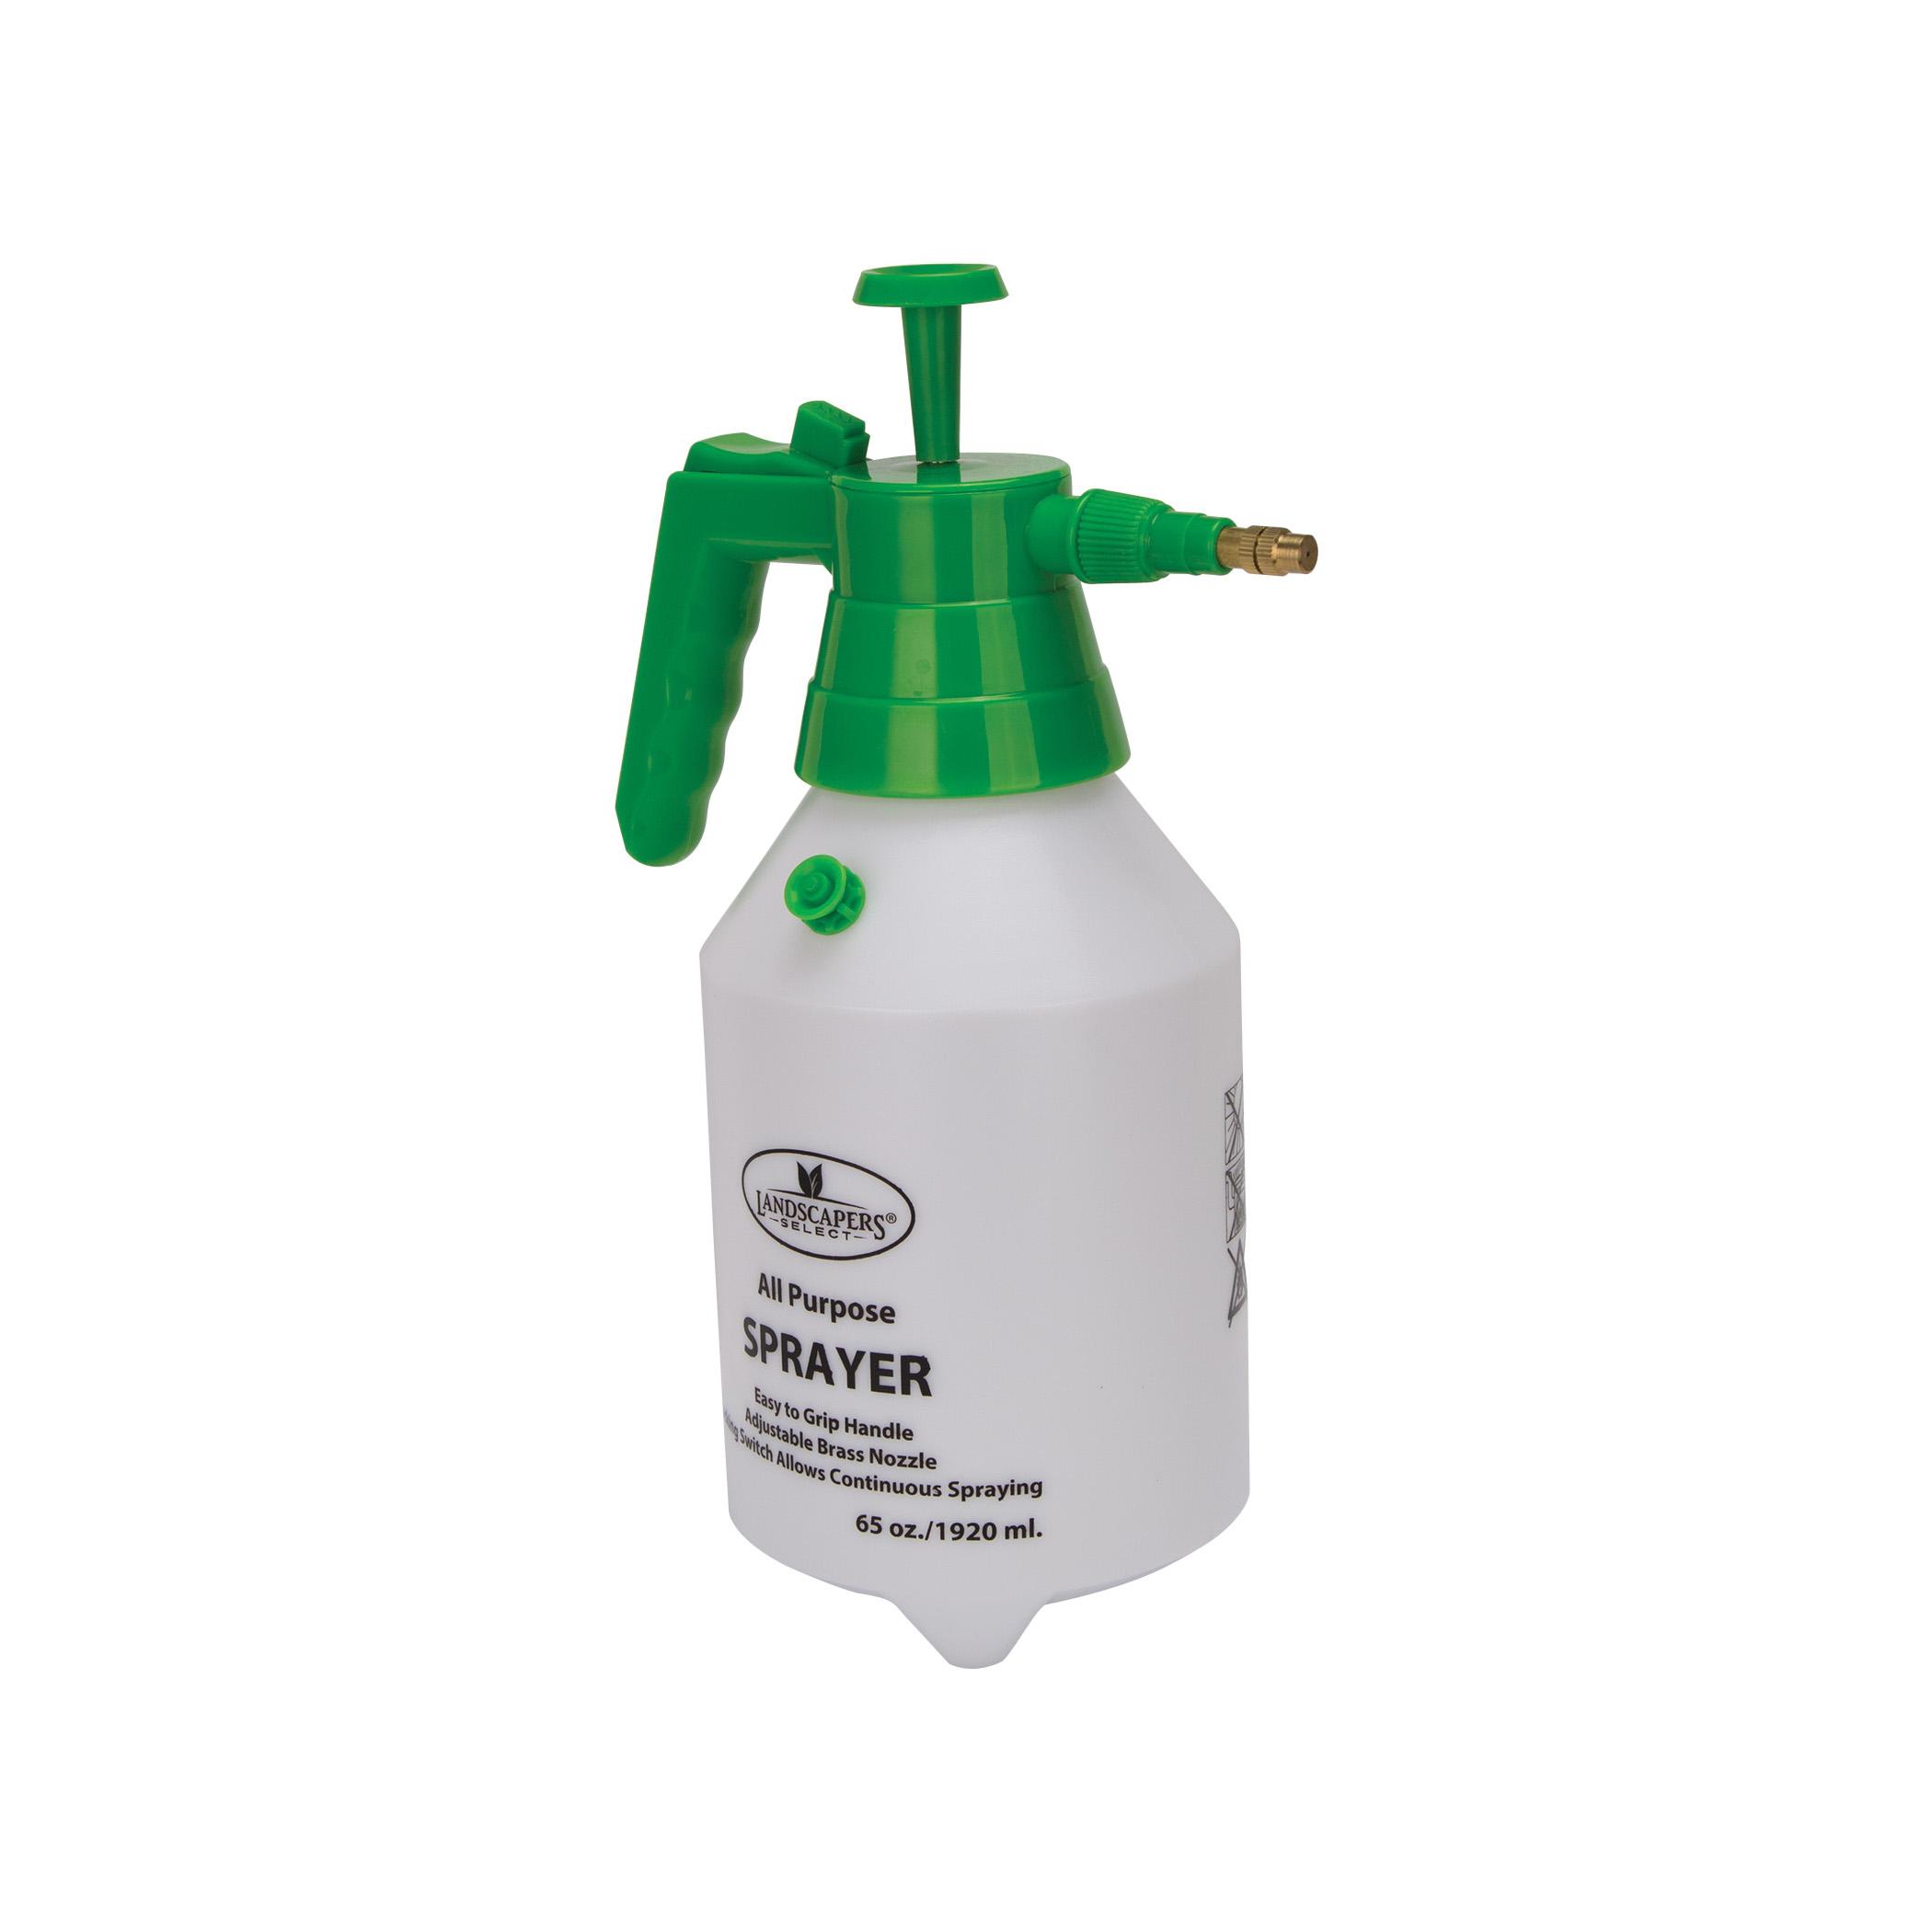 Picture of Landscapers Select SX-5073-33L Pressure Sprayer, Adjustable Nozzle, PE, White